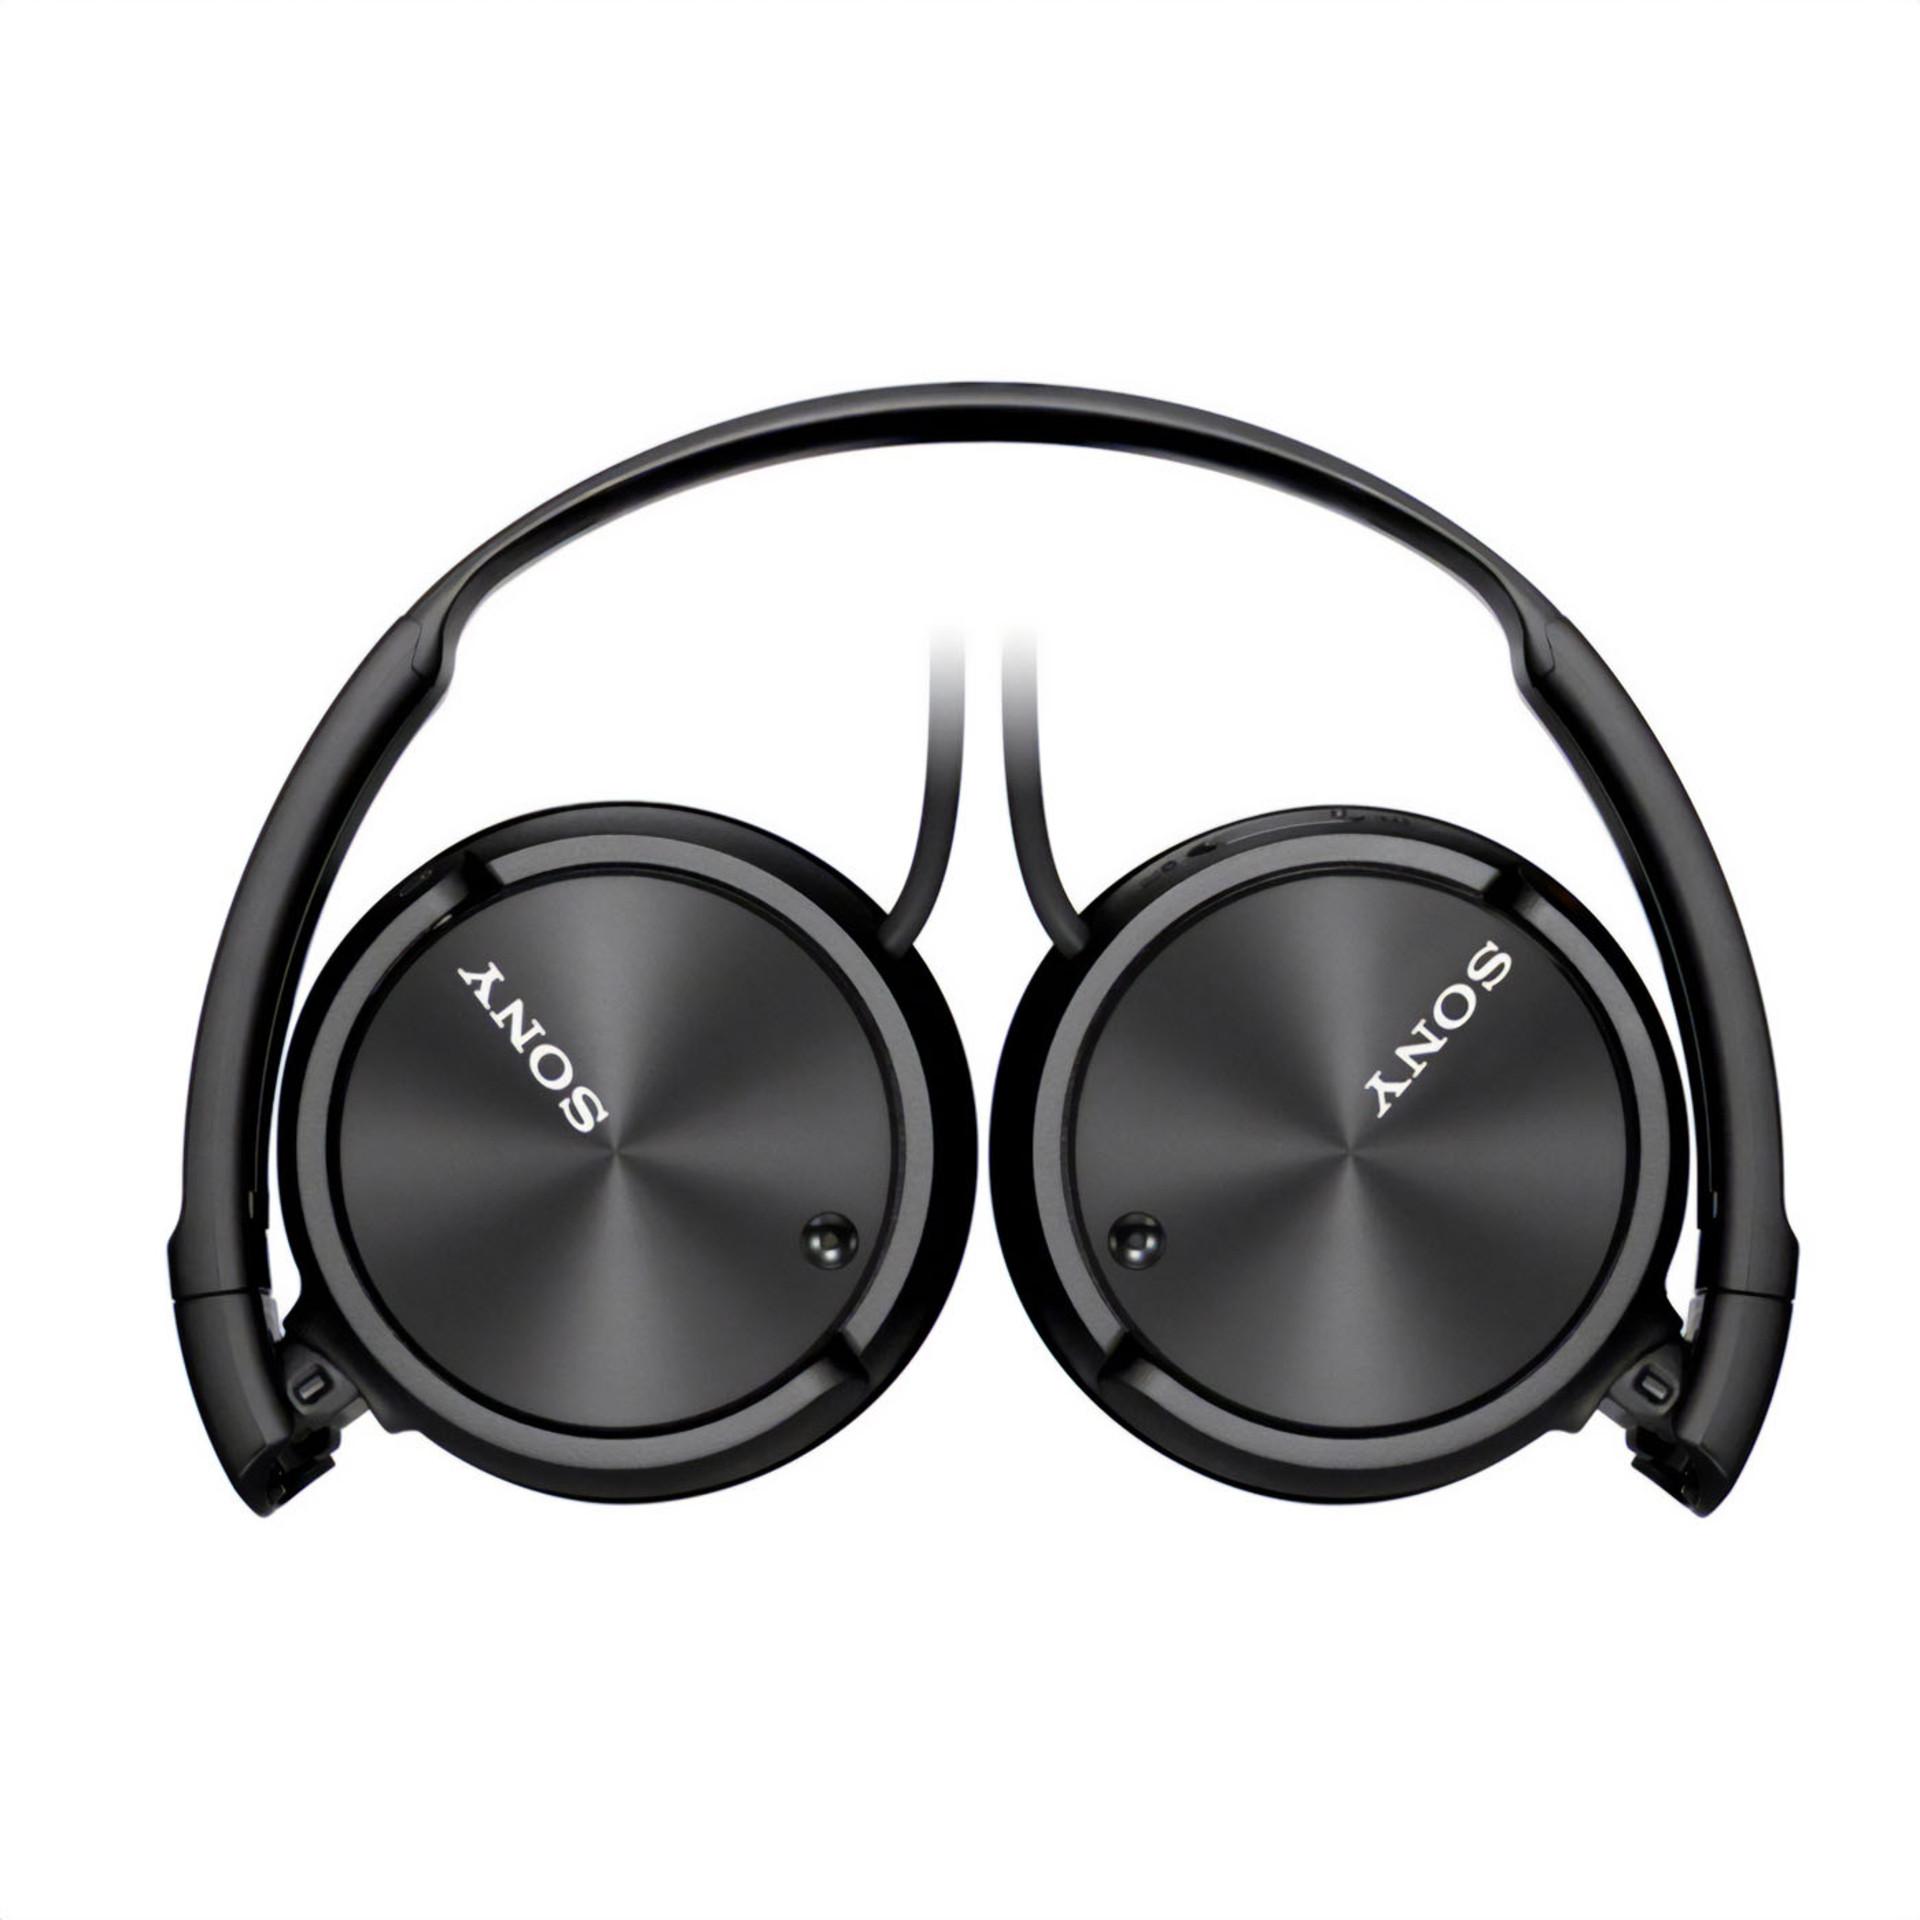 Sony Black ZX110NC Noise Canceling Headphones Folded